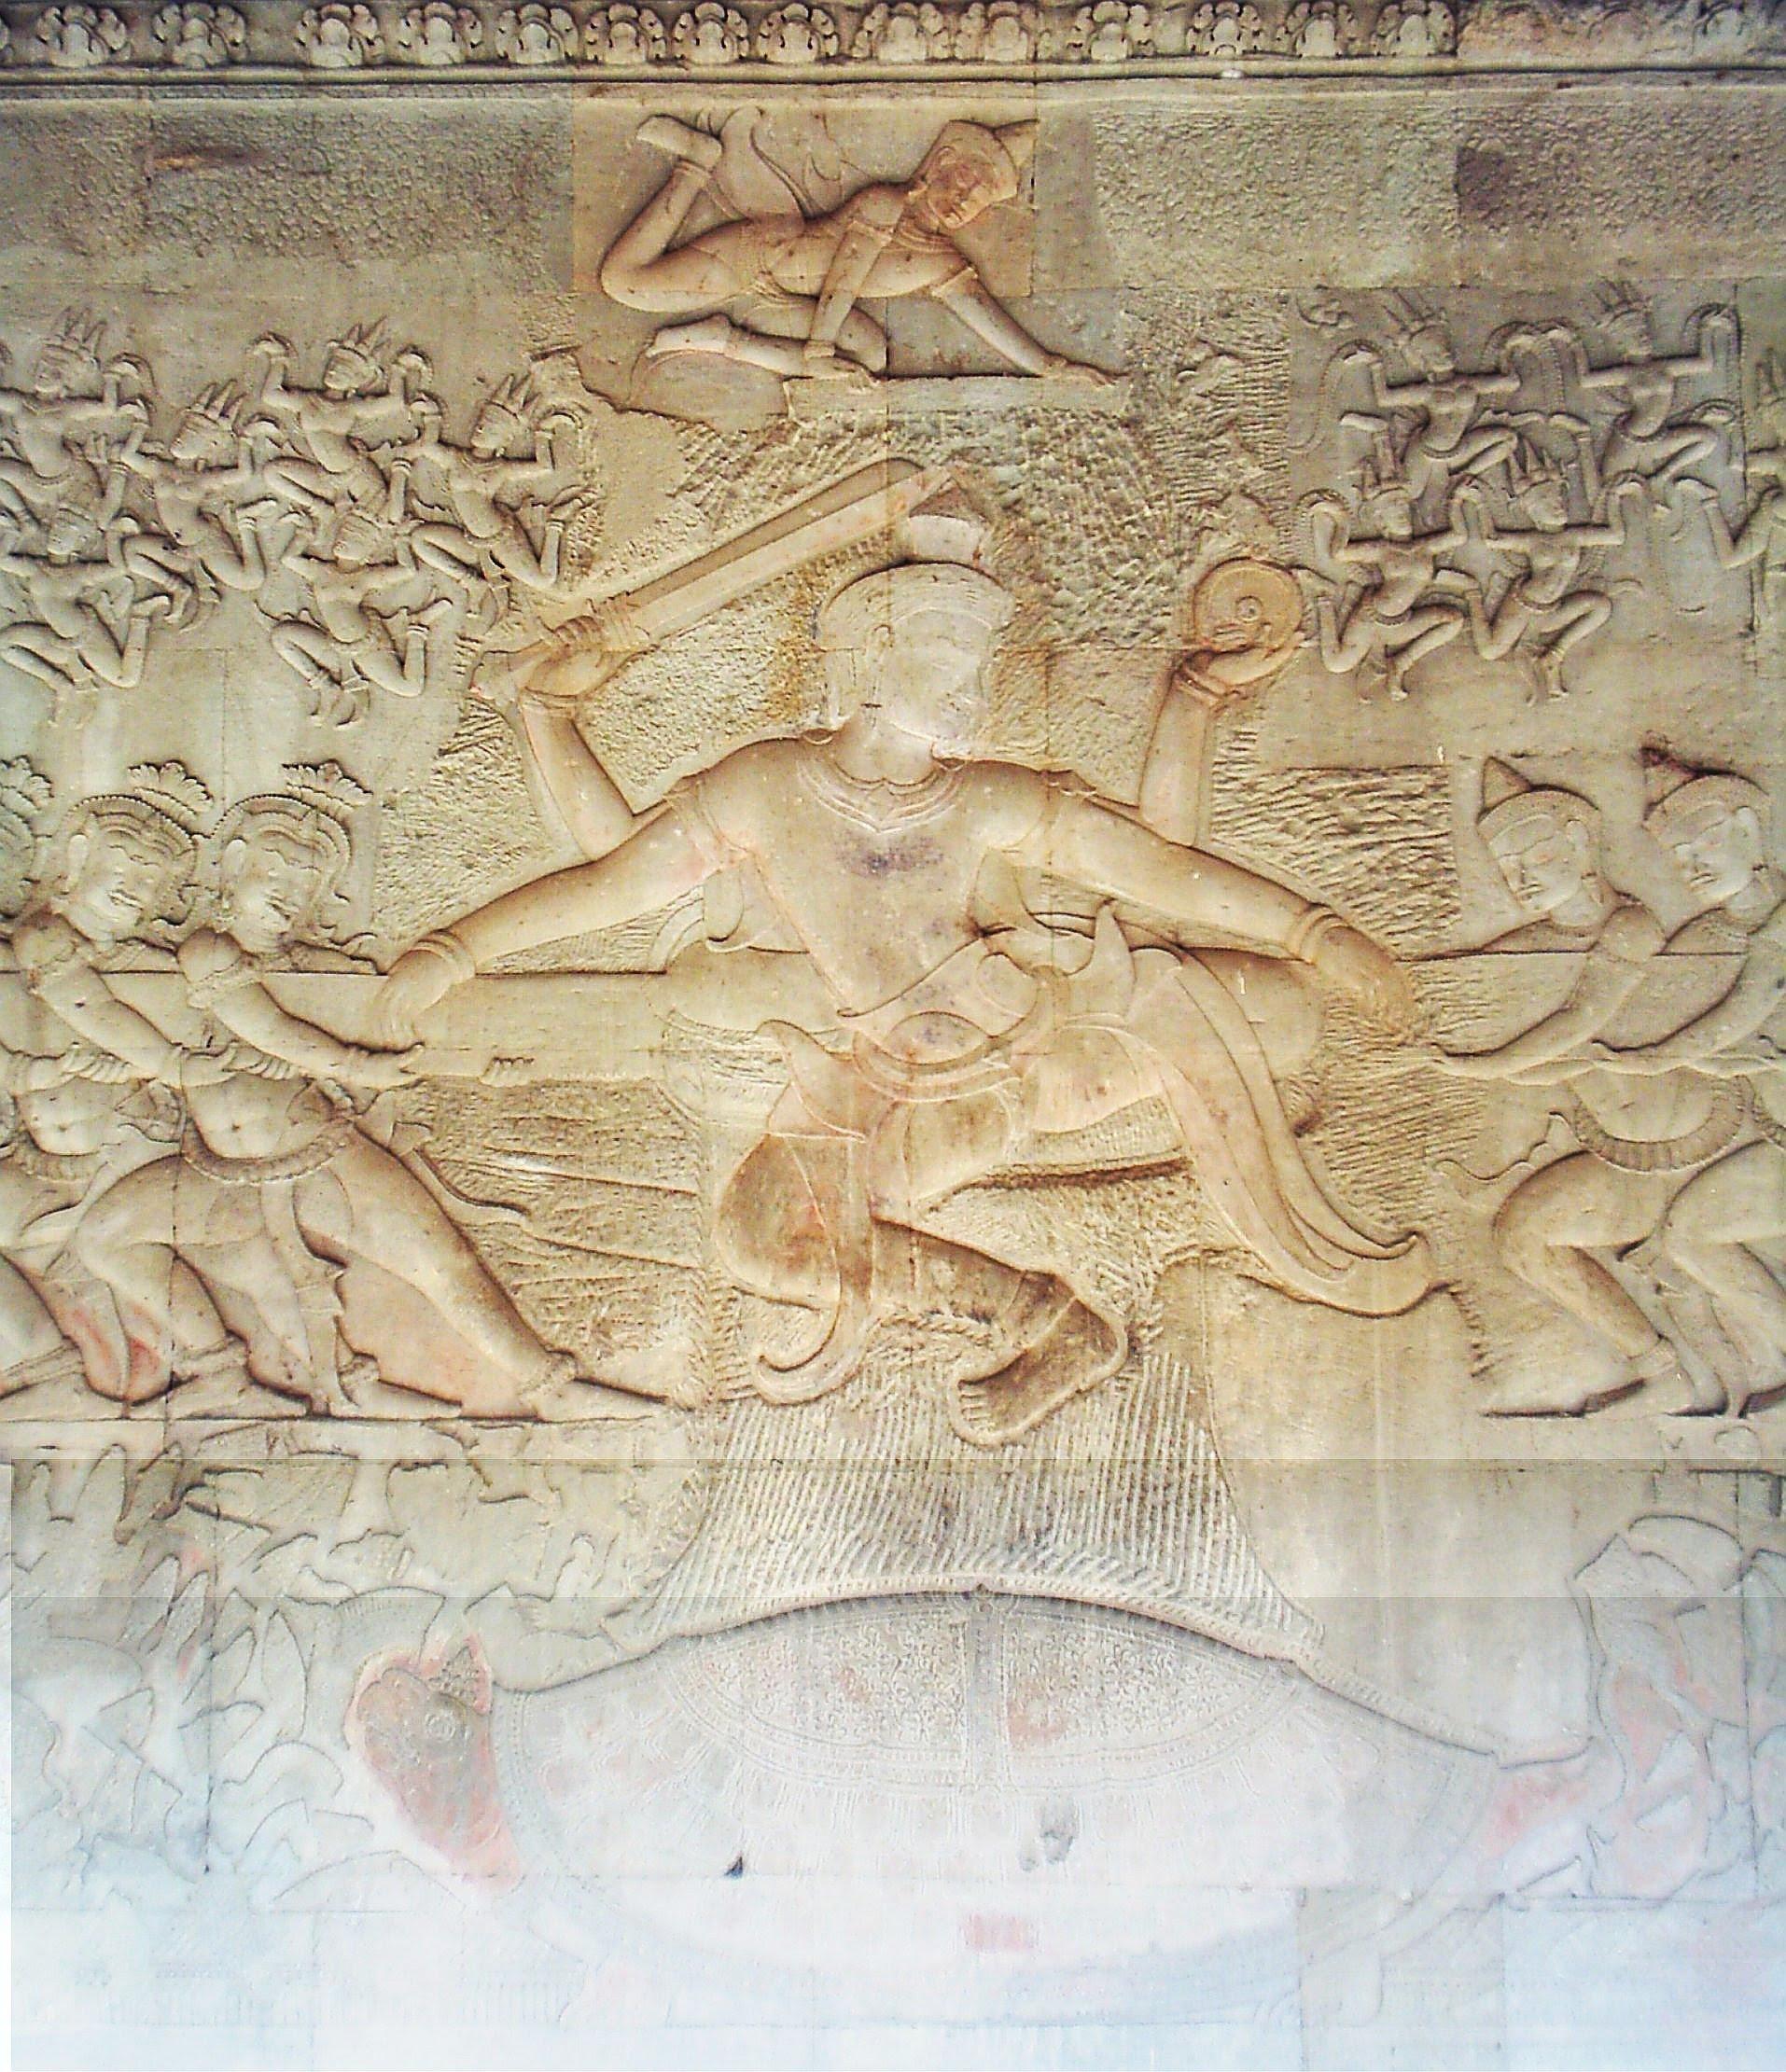 King Suryavaraman's procession